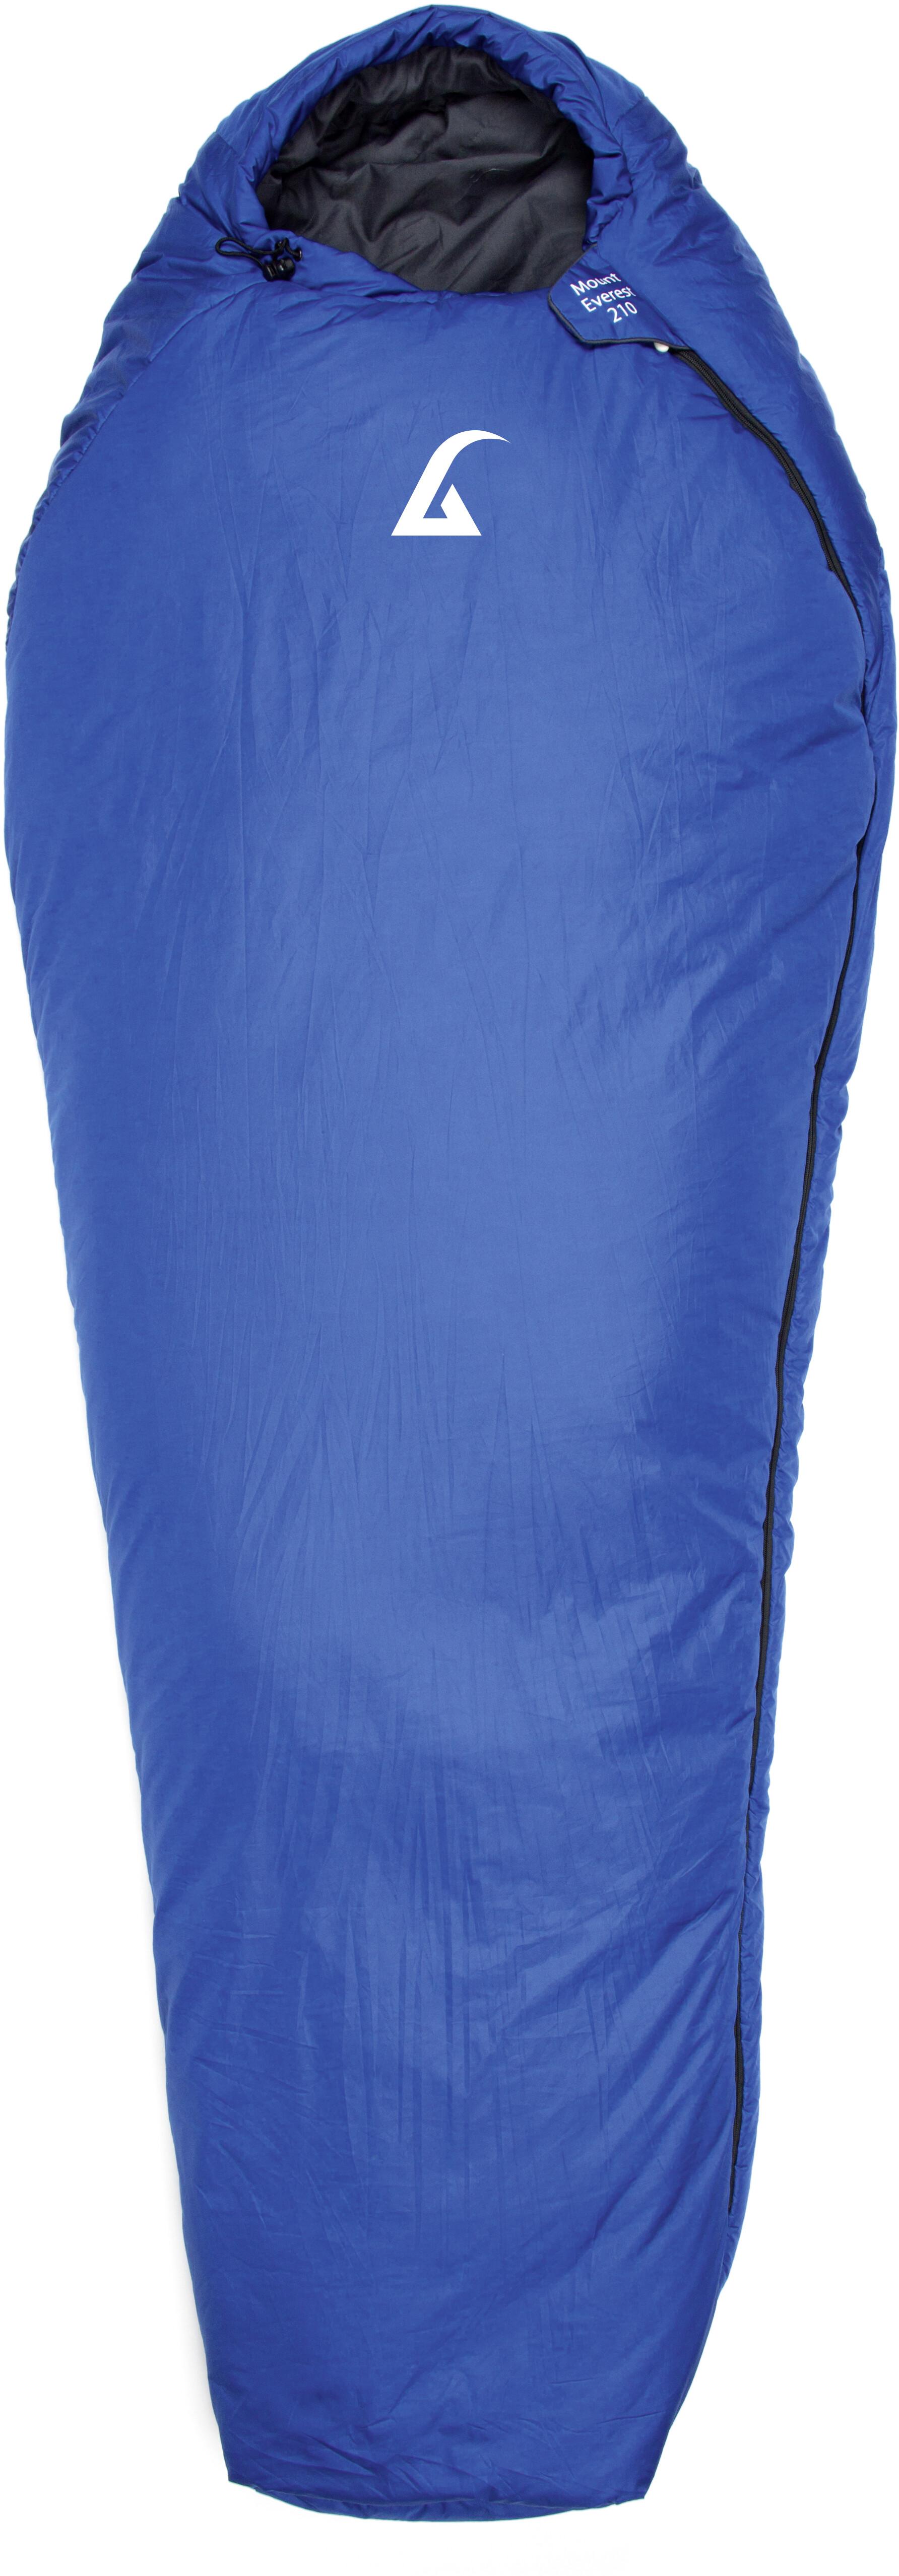 Alvivo Arctic Extreme 200 Polyester Schlafsack blau